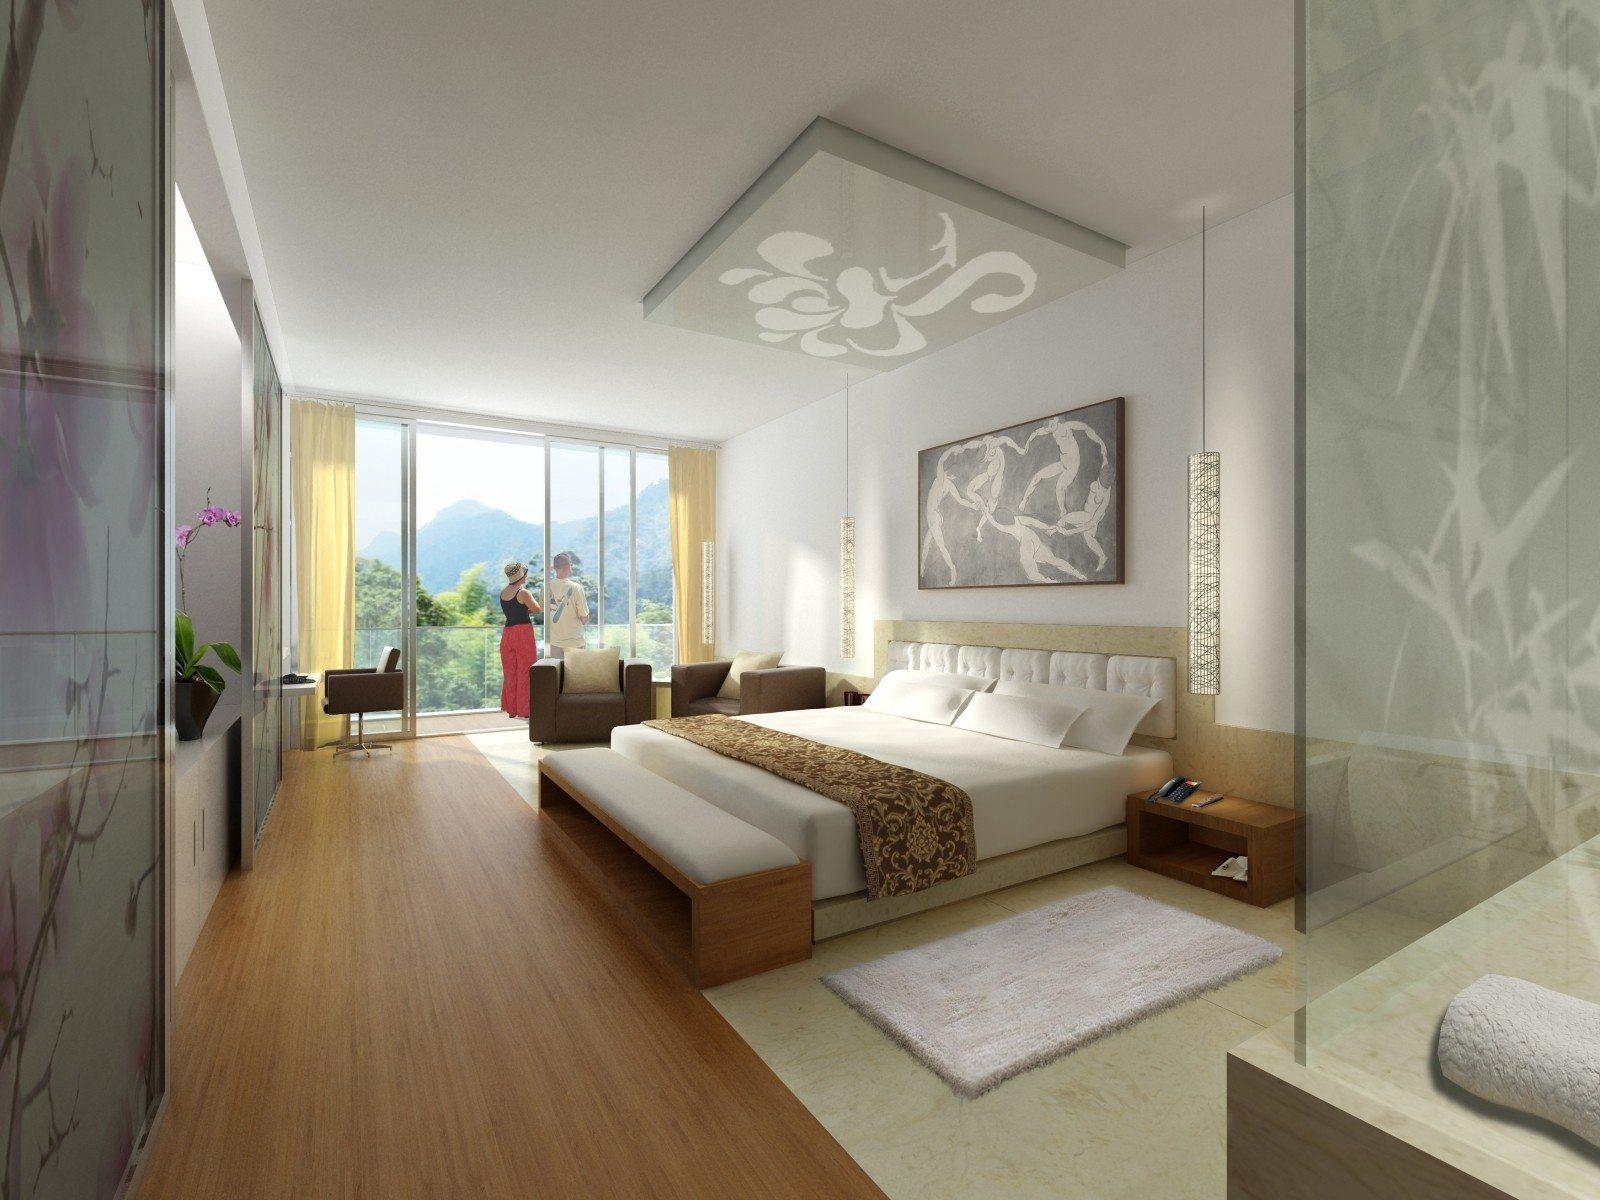 interior-hotel-rendering-visualization-architecture-5